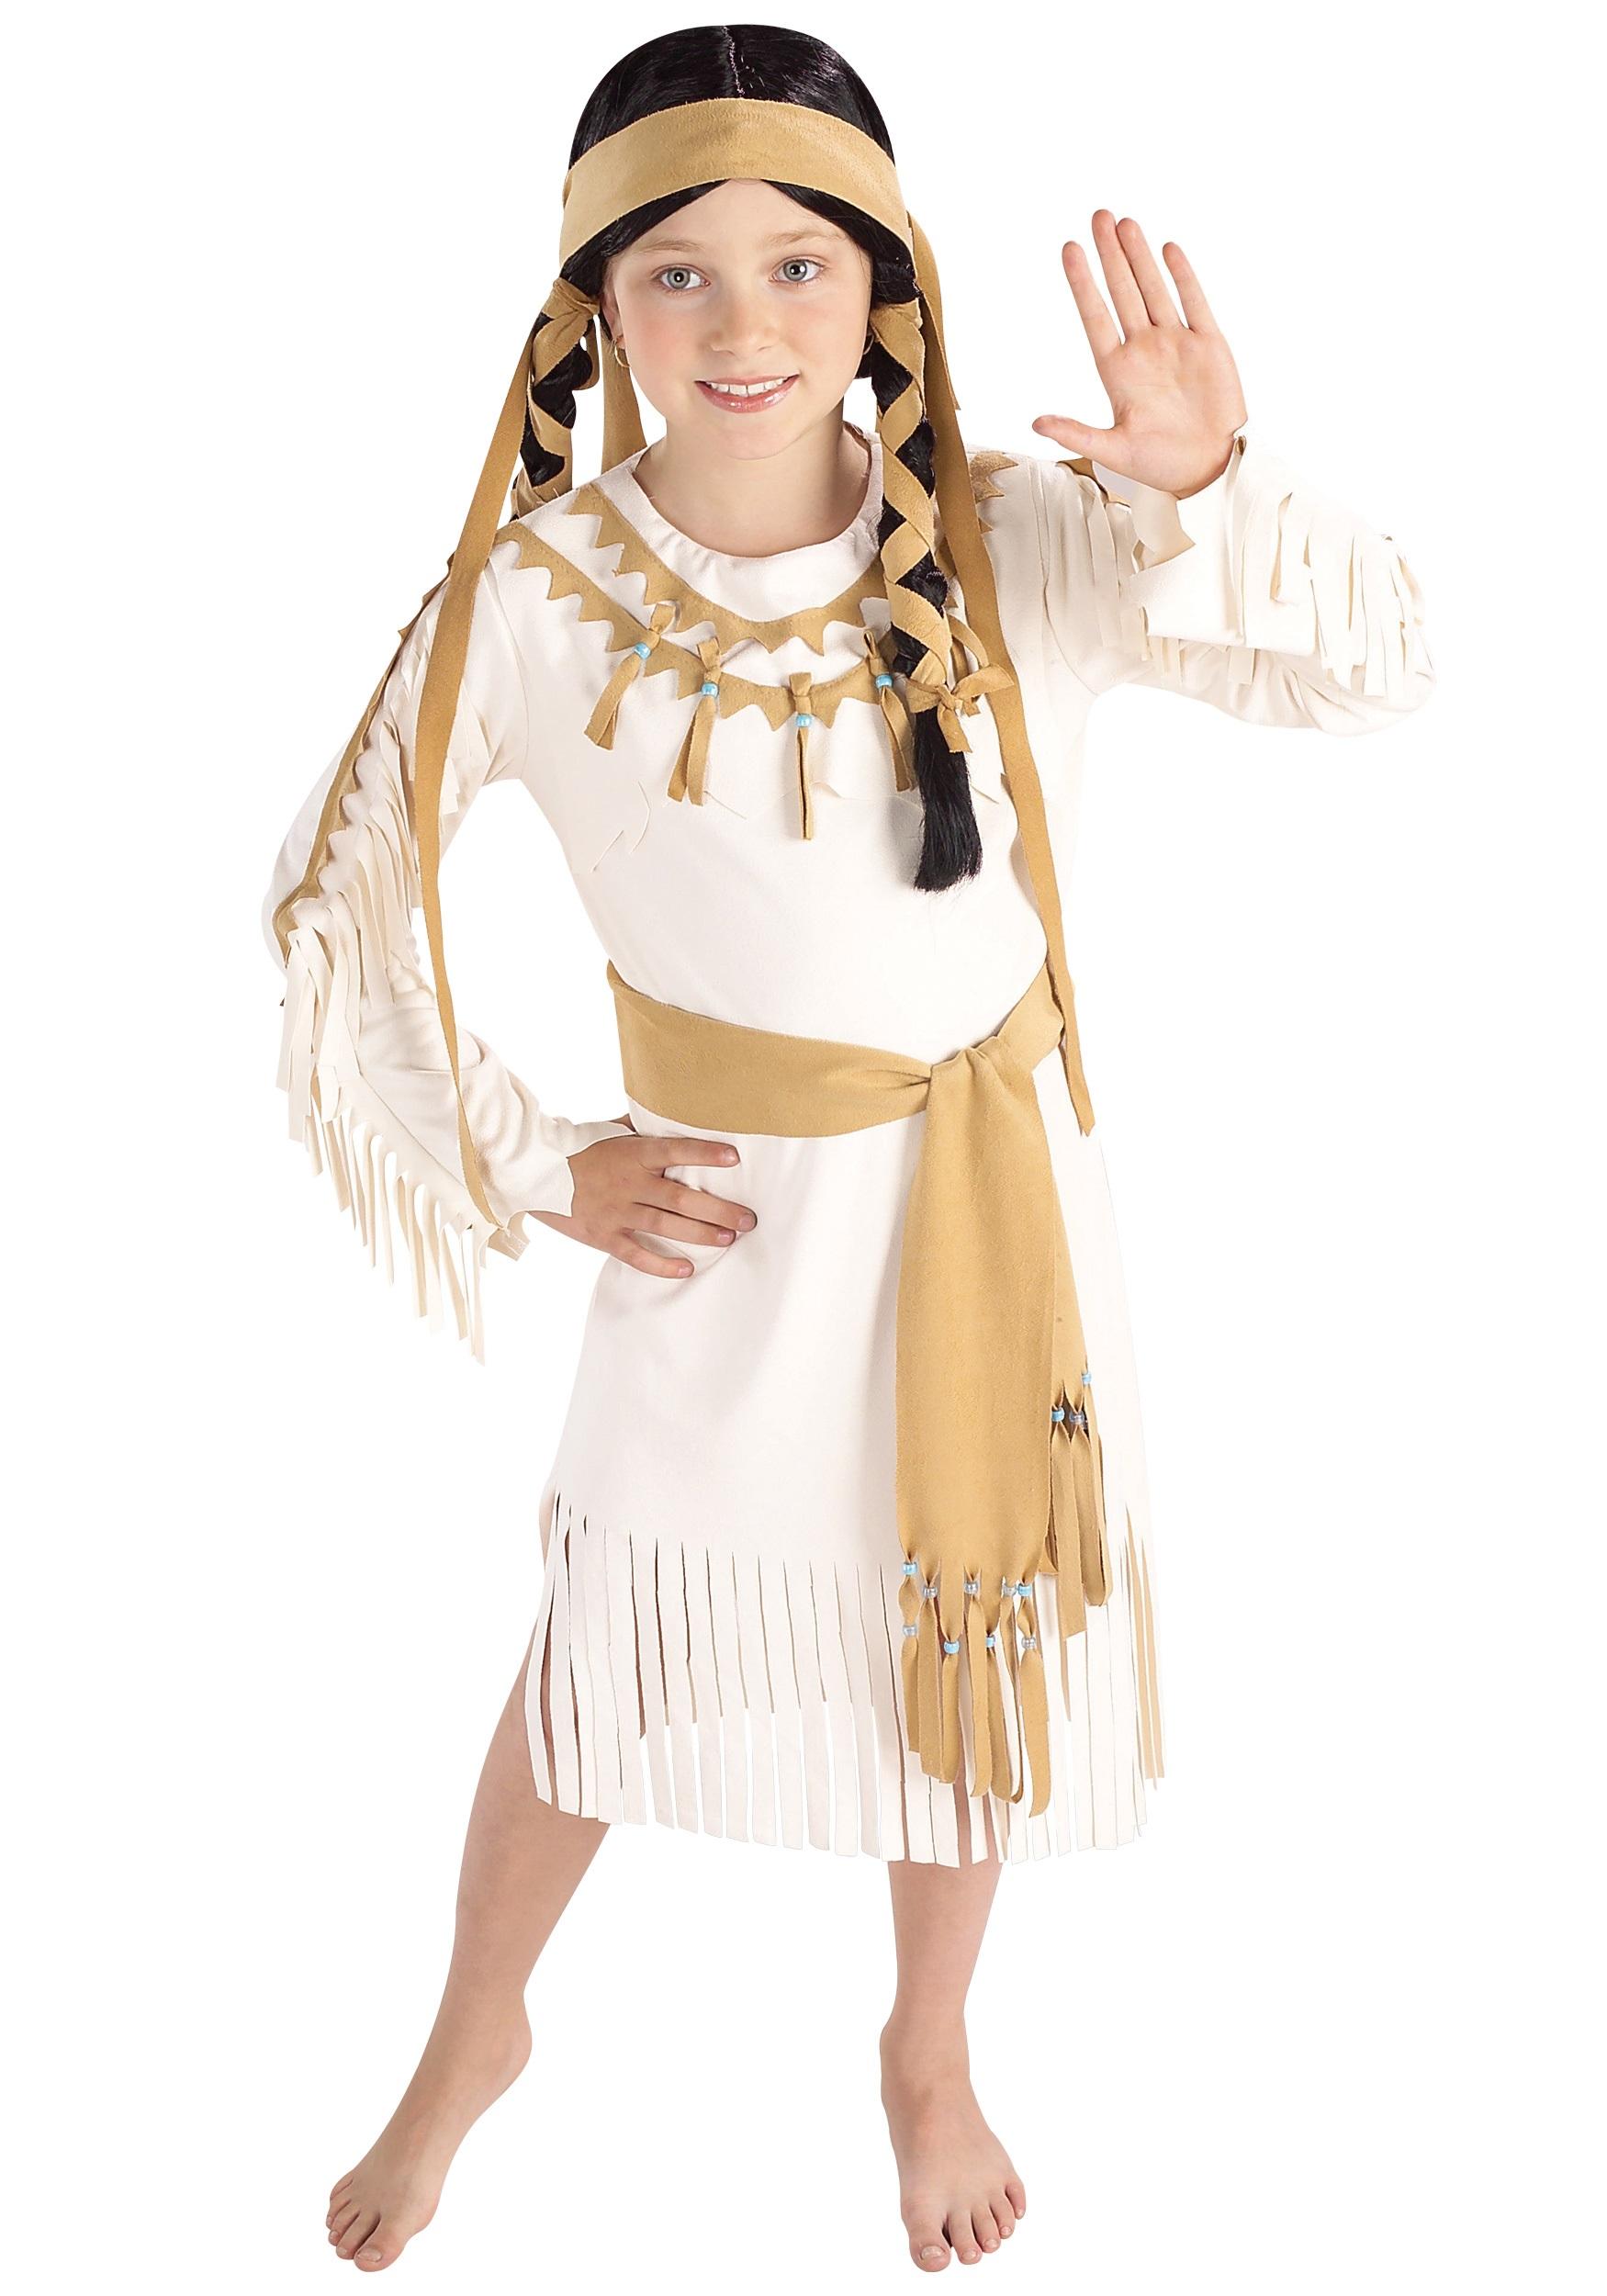 ... child clic indian costume · native american costume ...  sc 1 st  Best Kids Costumes & Kids Indian Costume - Best Kids Costumes